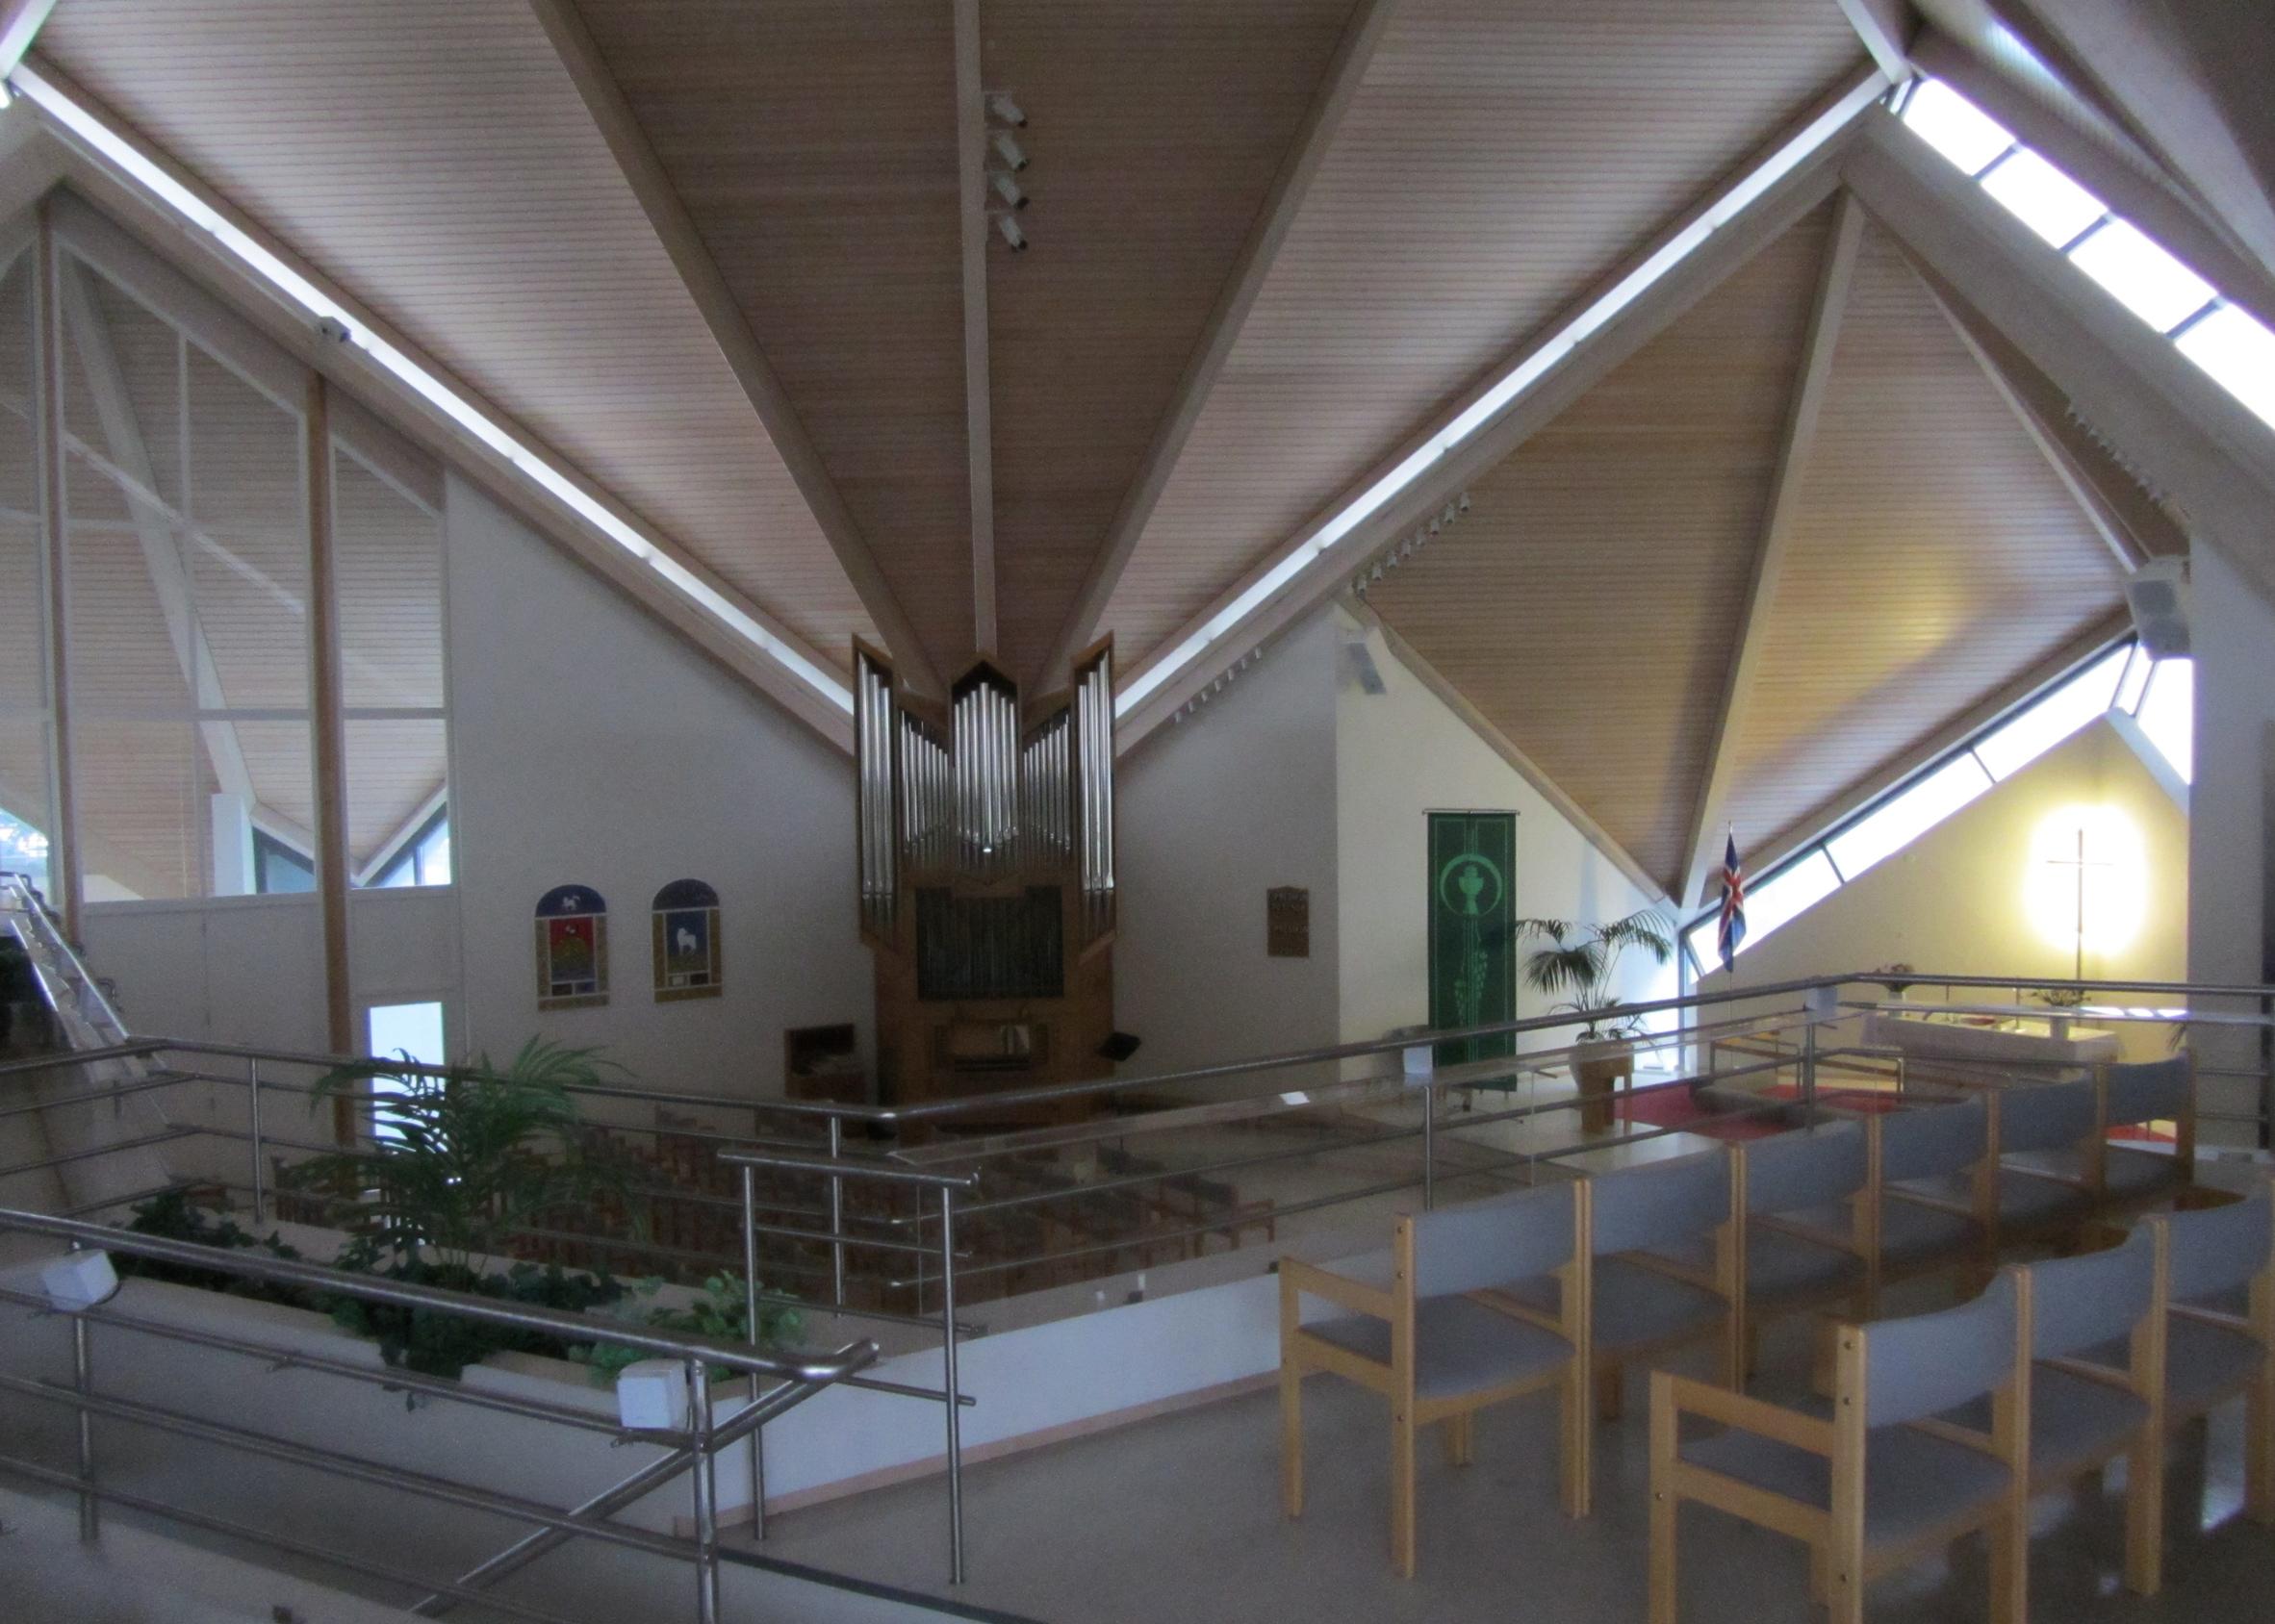 Seltjarnarneskirkja by Harðar Björnssonar, 1989